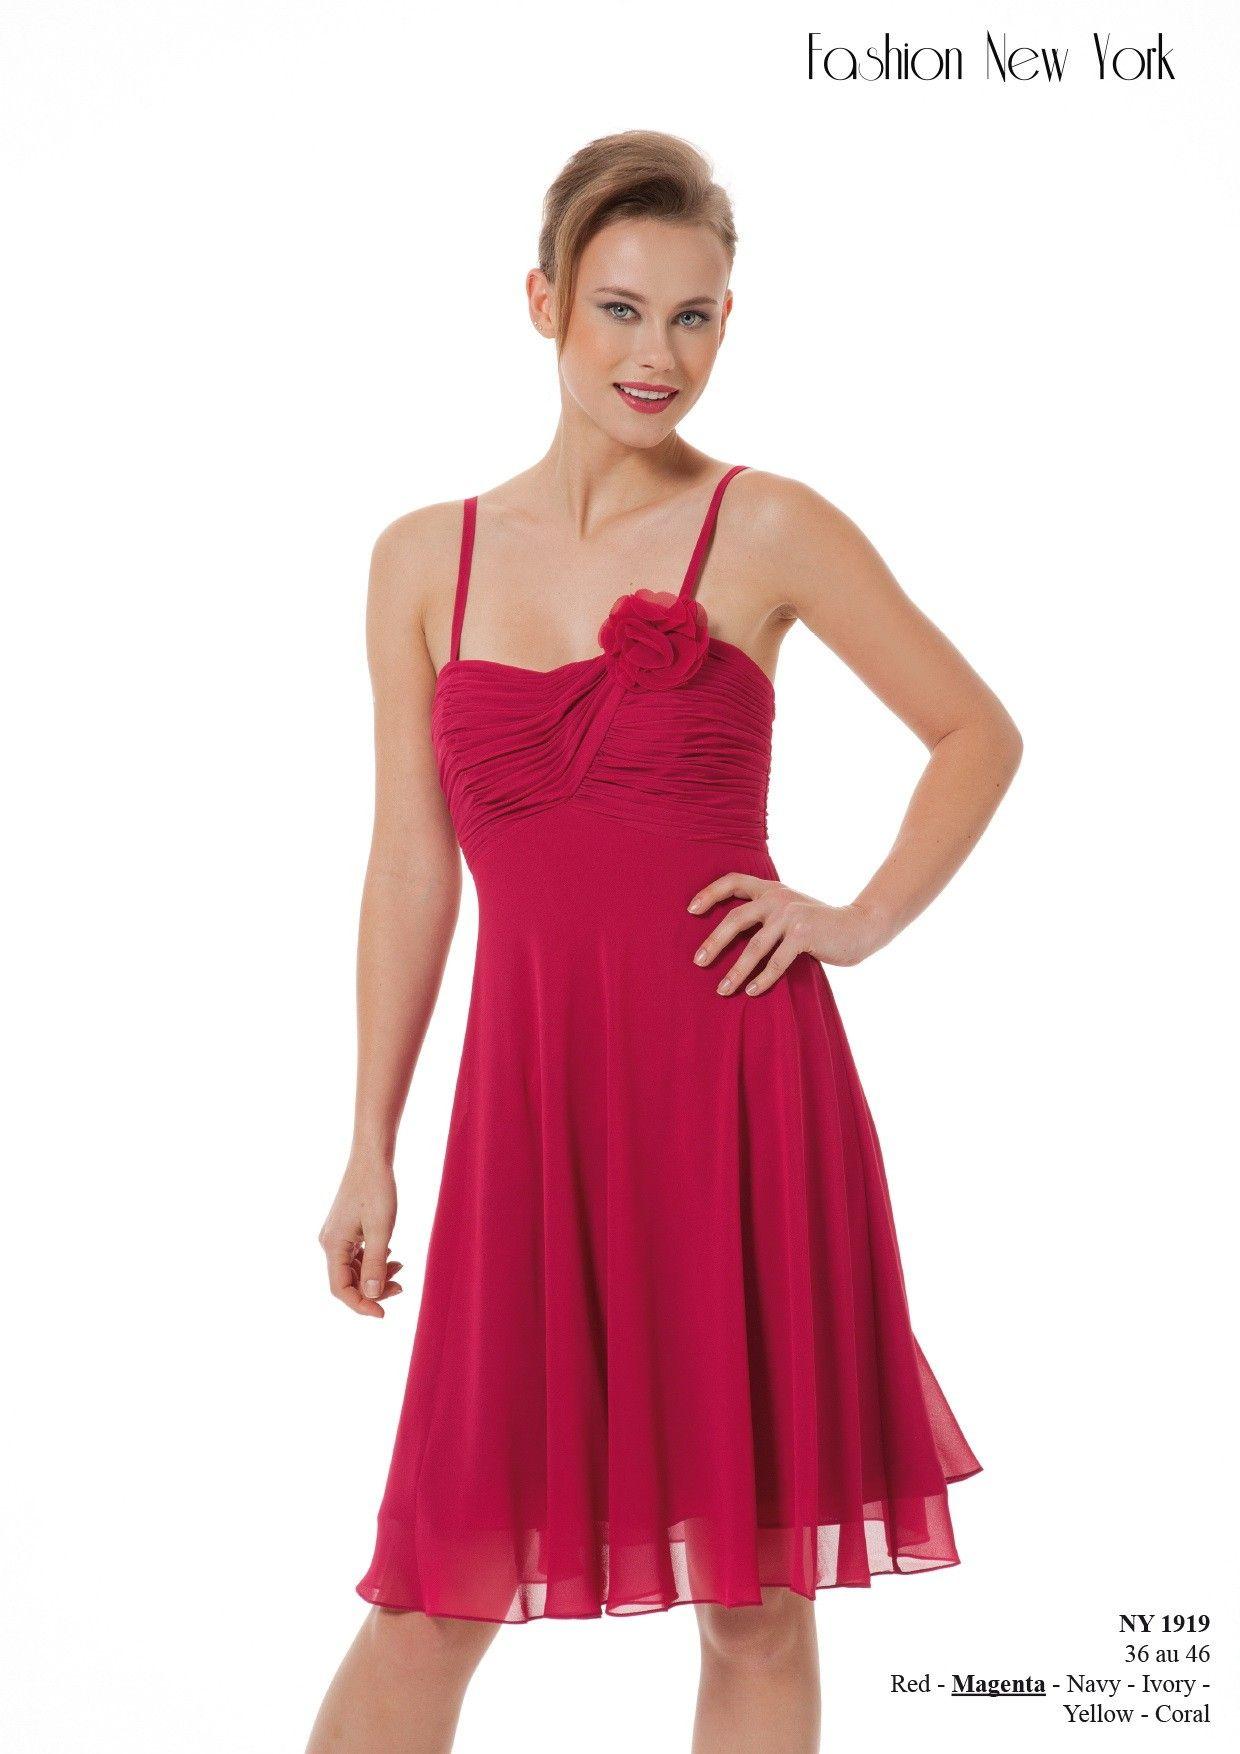 Robes de mariée Fashion New York 2015 - NY1919 - Référence : NY1919 $202.99 Fashion New York 2015